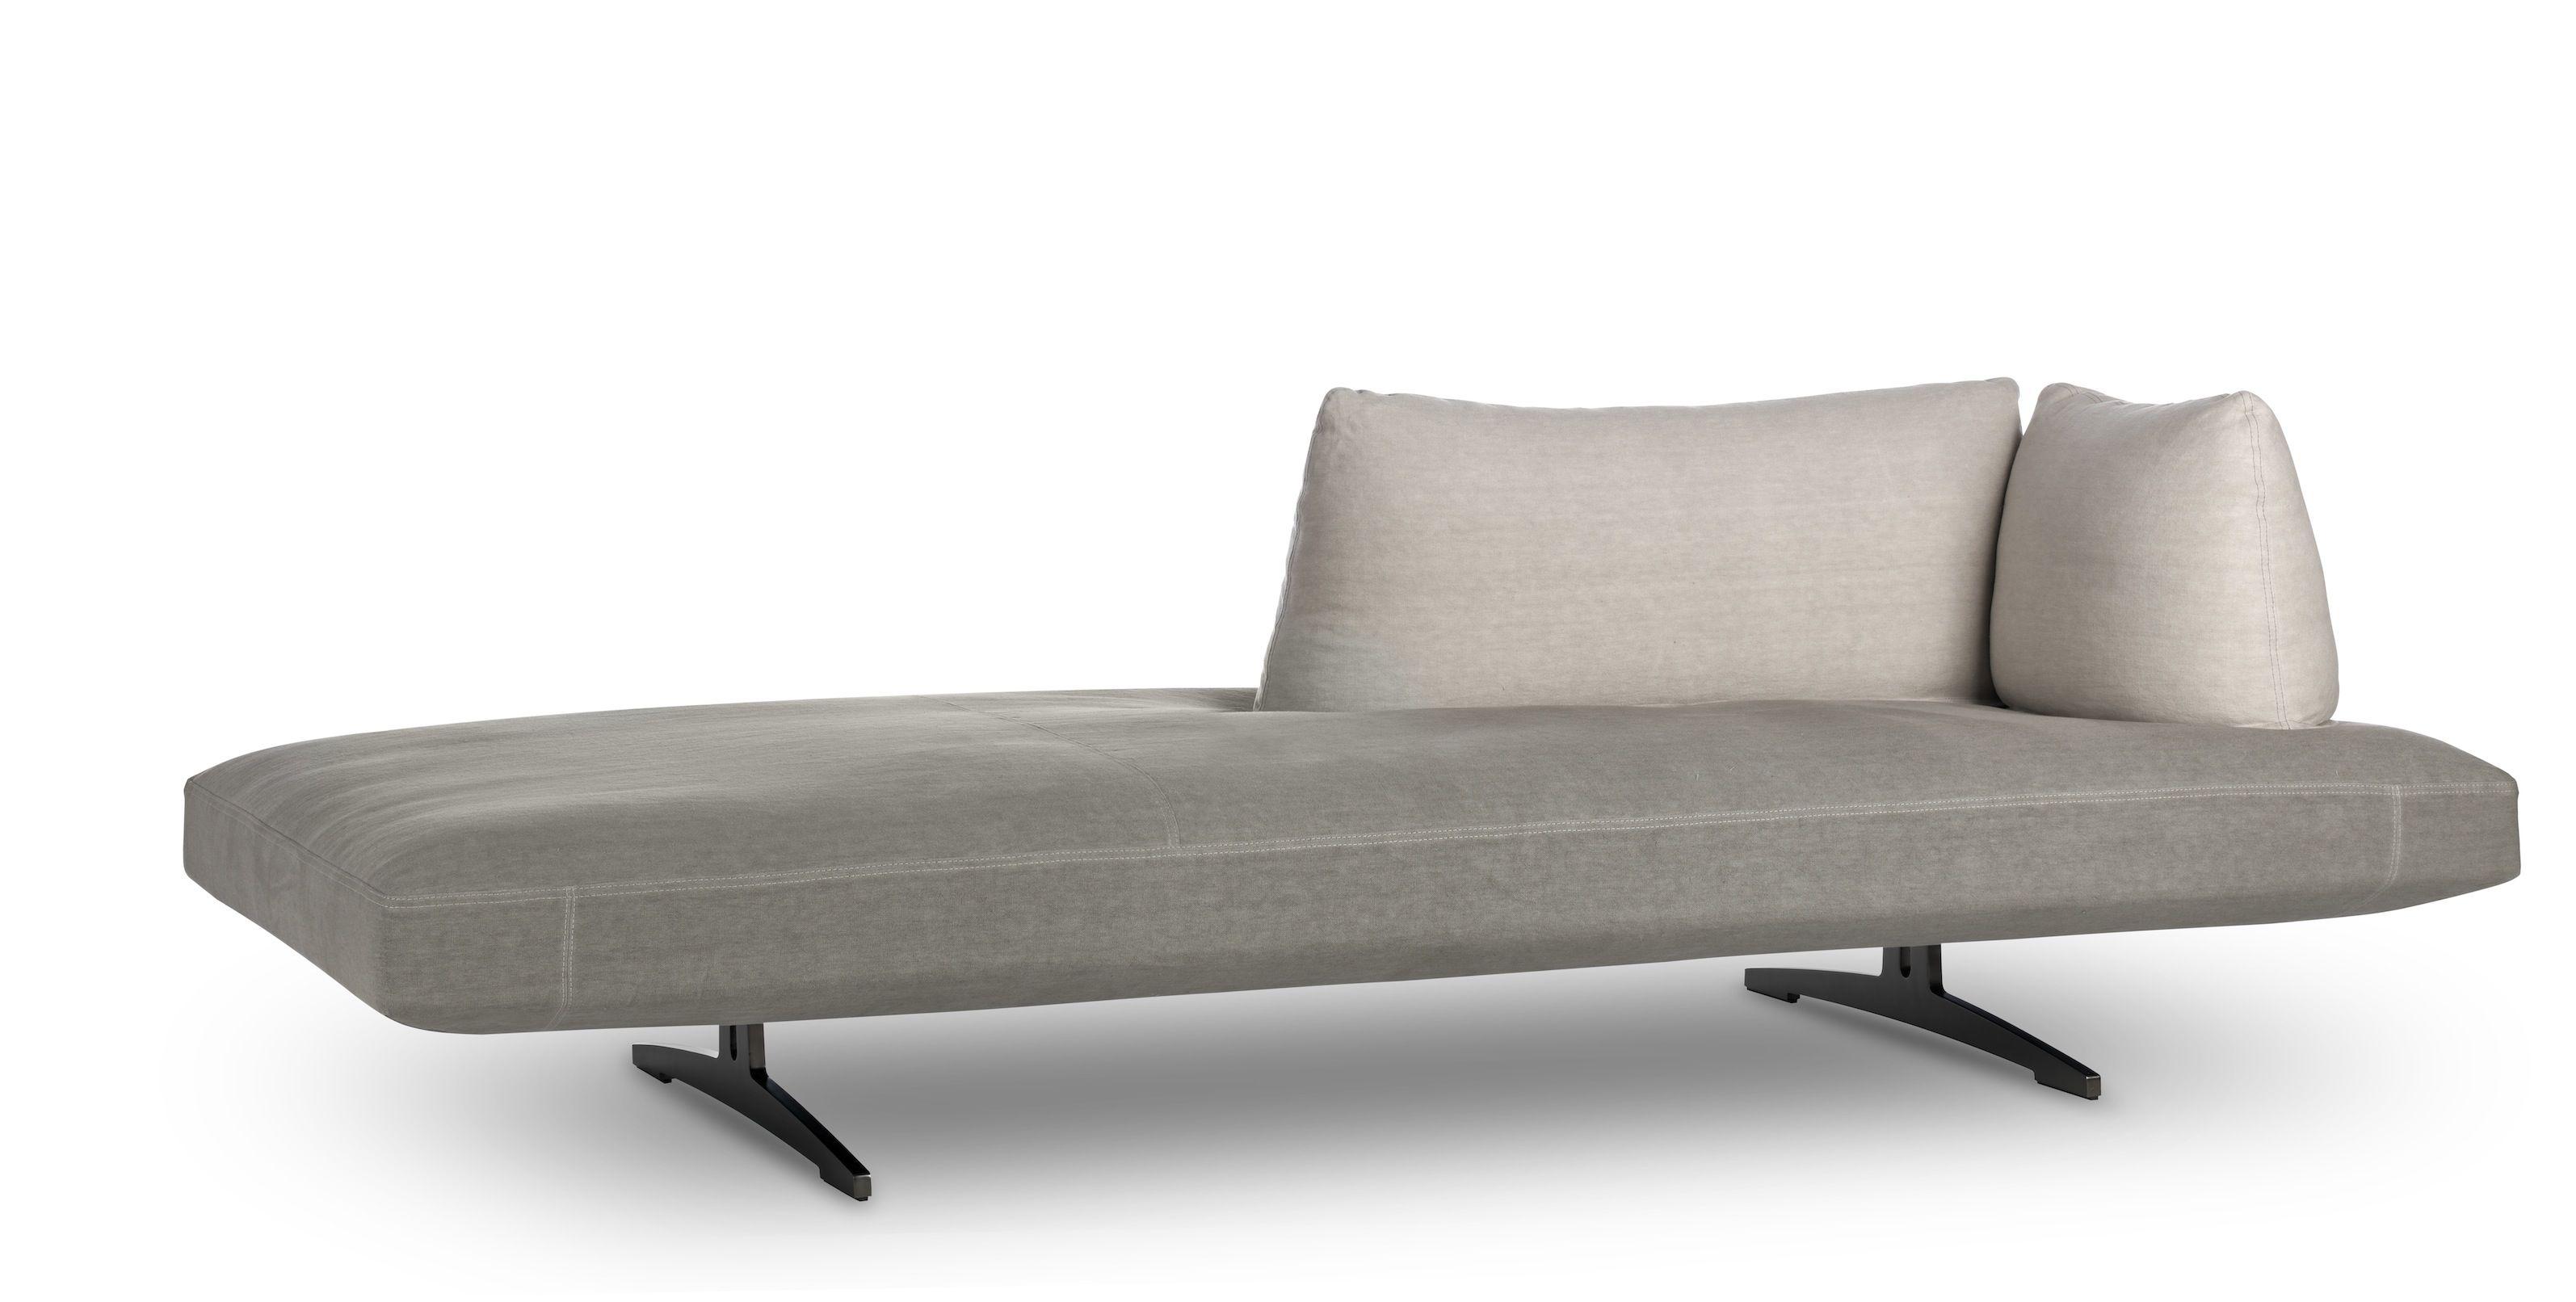 Lovely Day Sofa Designed By Marc Sadler For Desiree Design